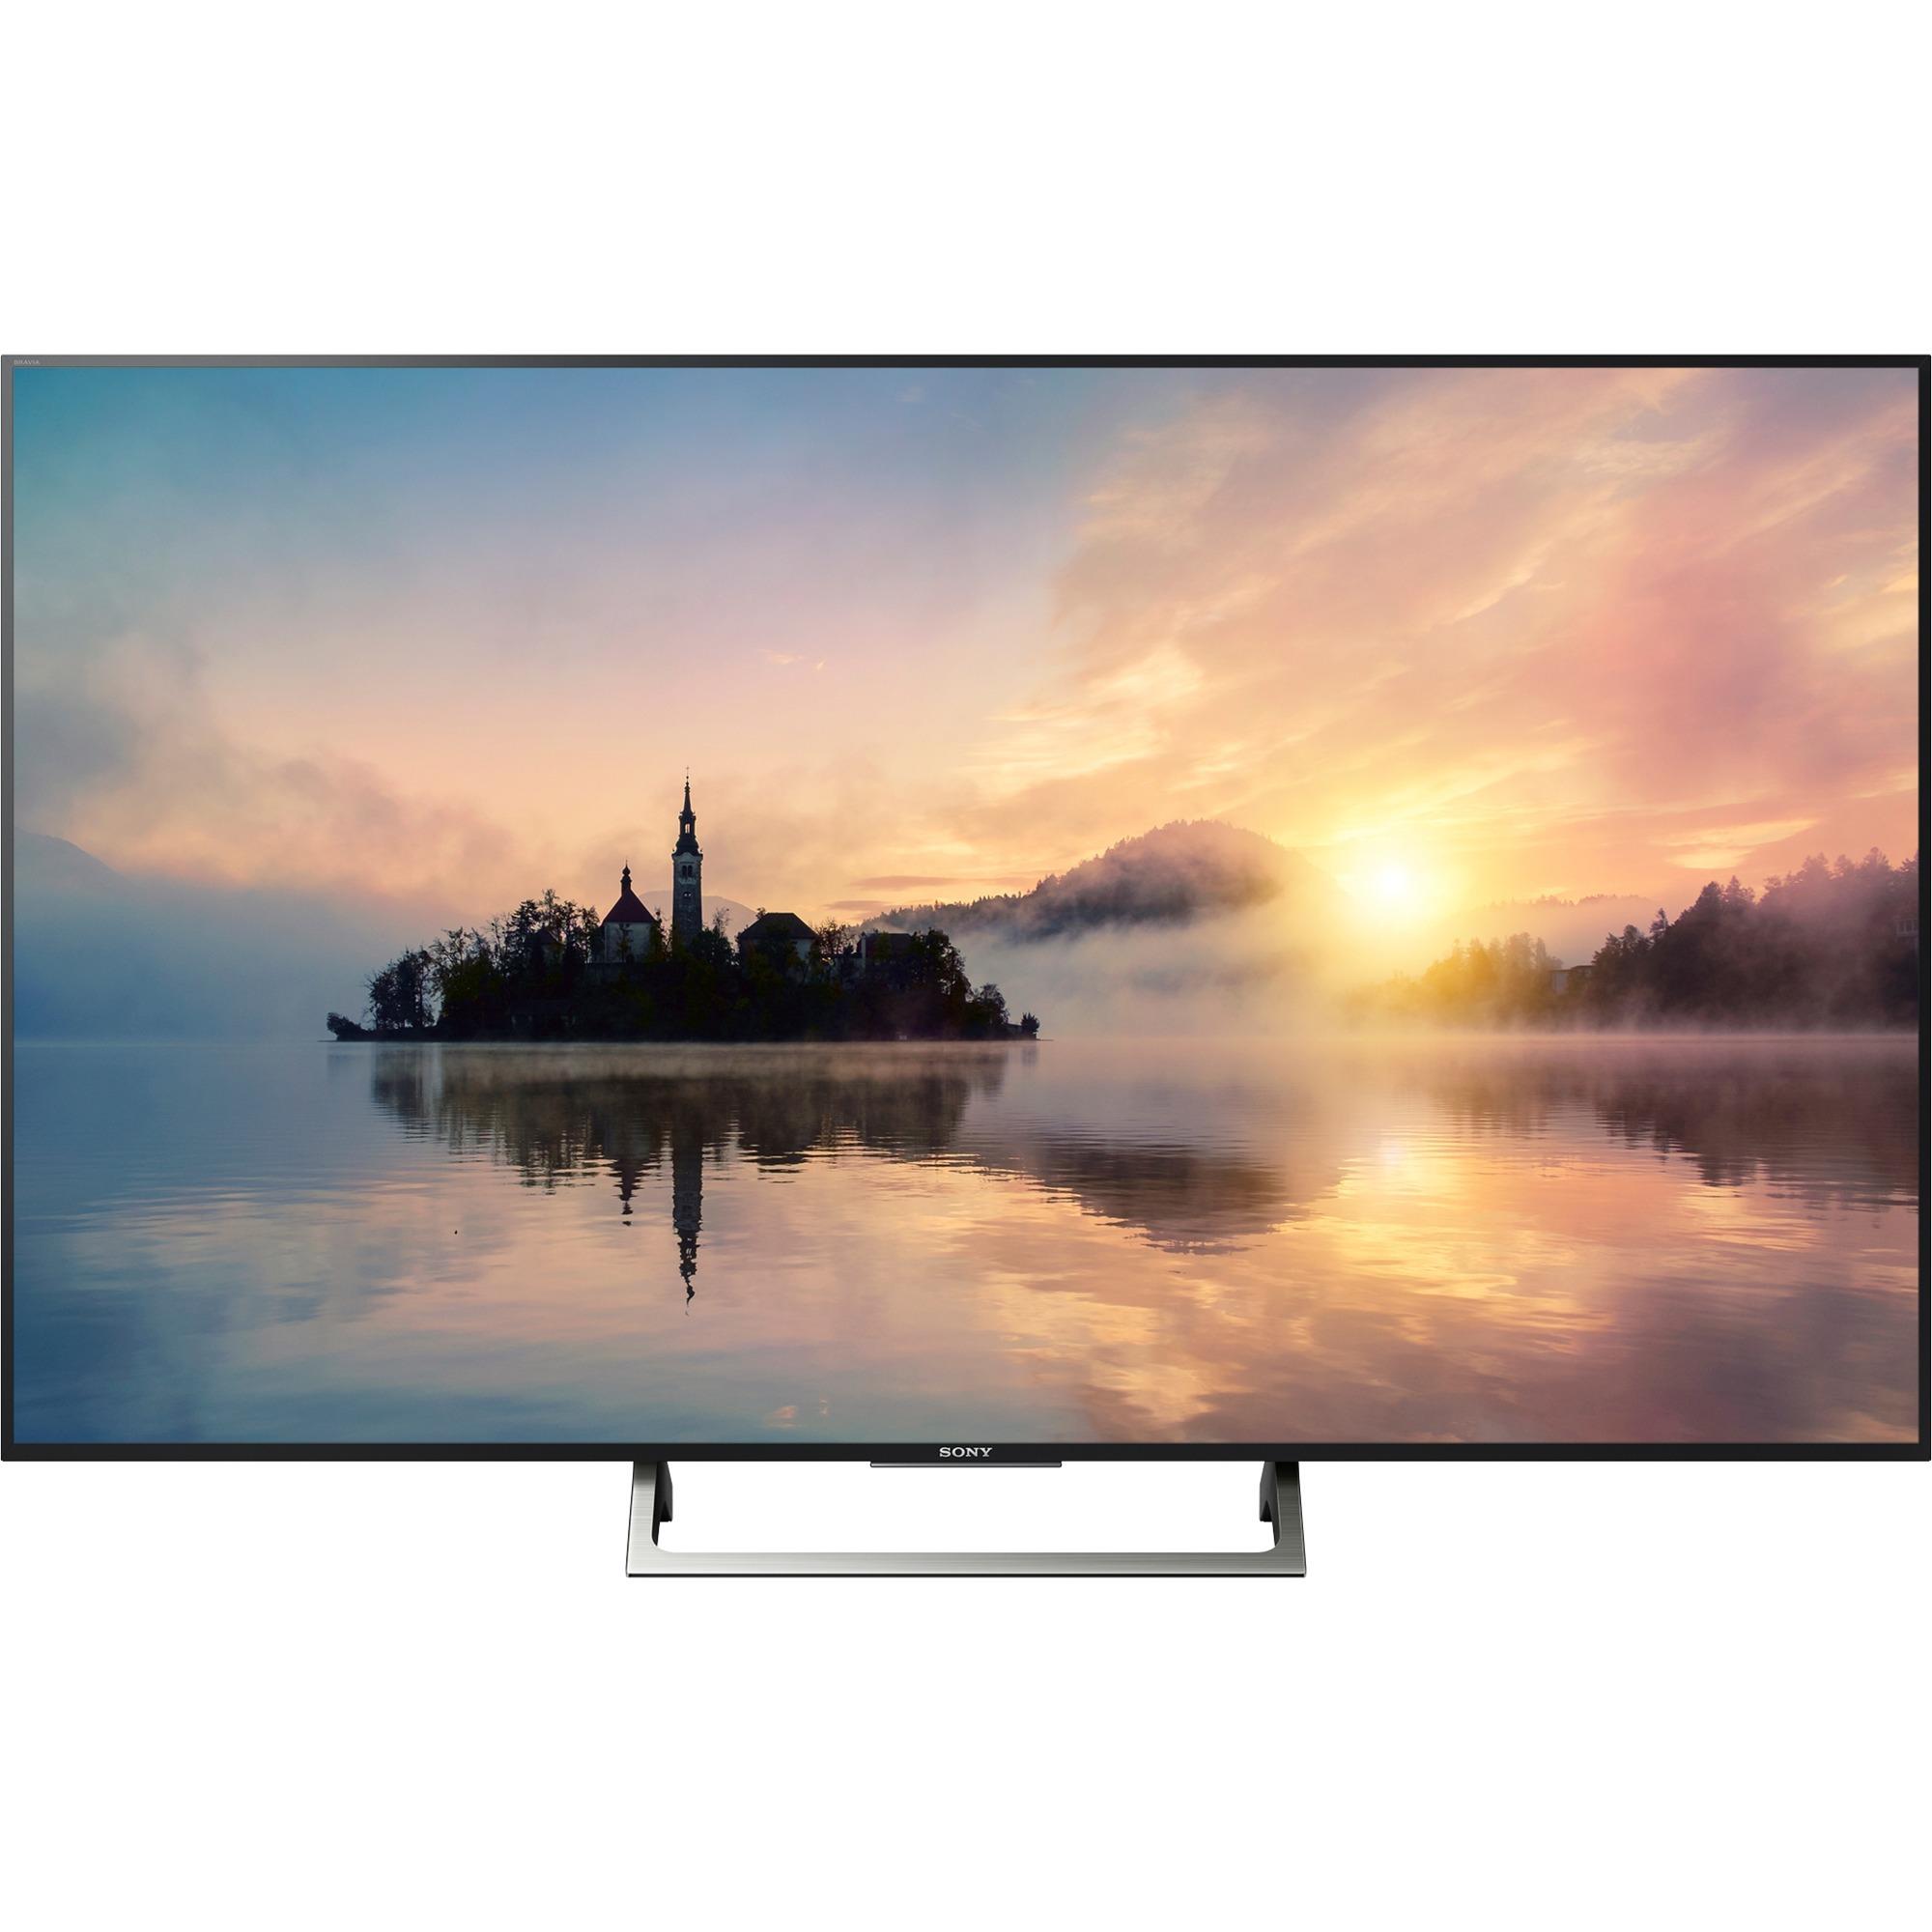 KD65XE7005BAEP 65 4K Ultra HD Smart TV Noir, Argent A+ 20W hospitality TV, Téléviseur LED